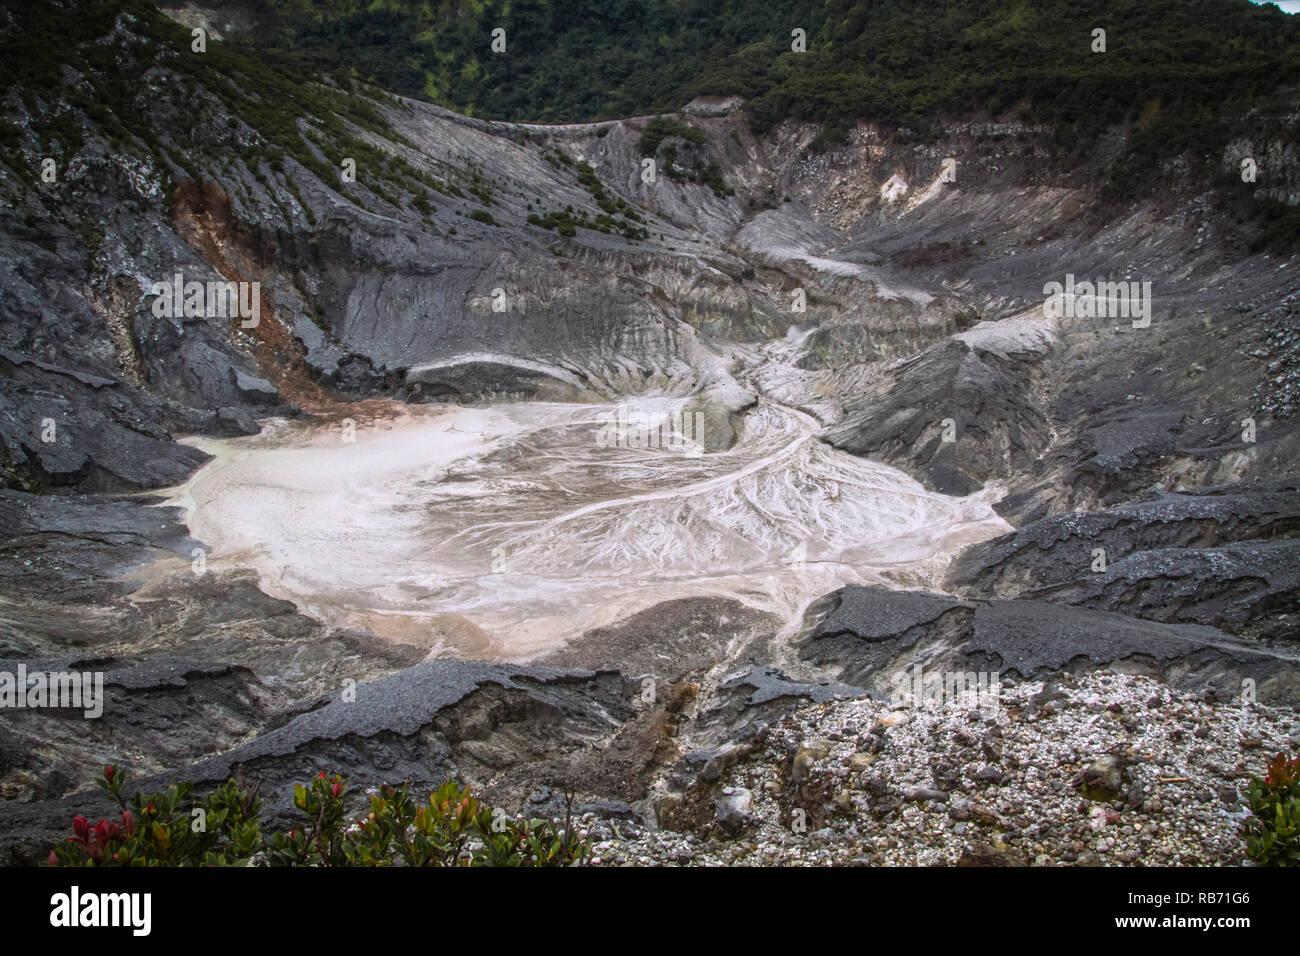 Tangkuban Perahu Volcanic Crater, Kawah Ratu West Java Indonesia - Stock Image